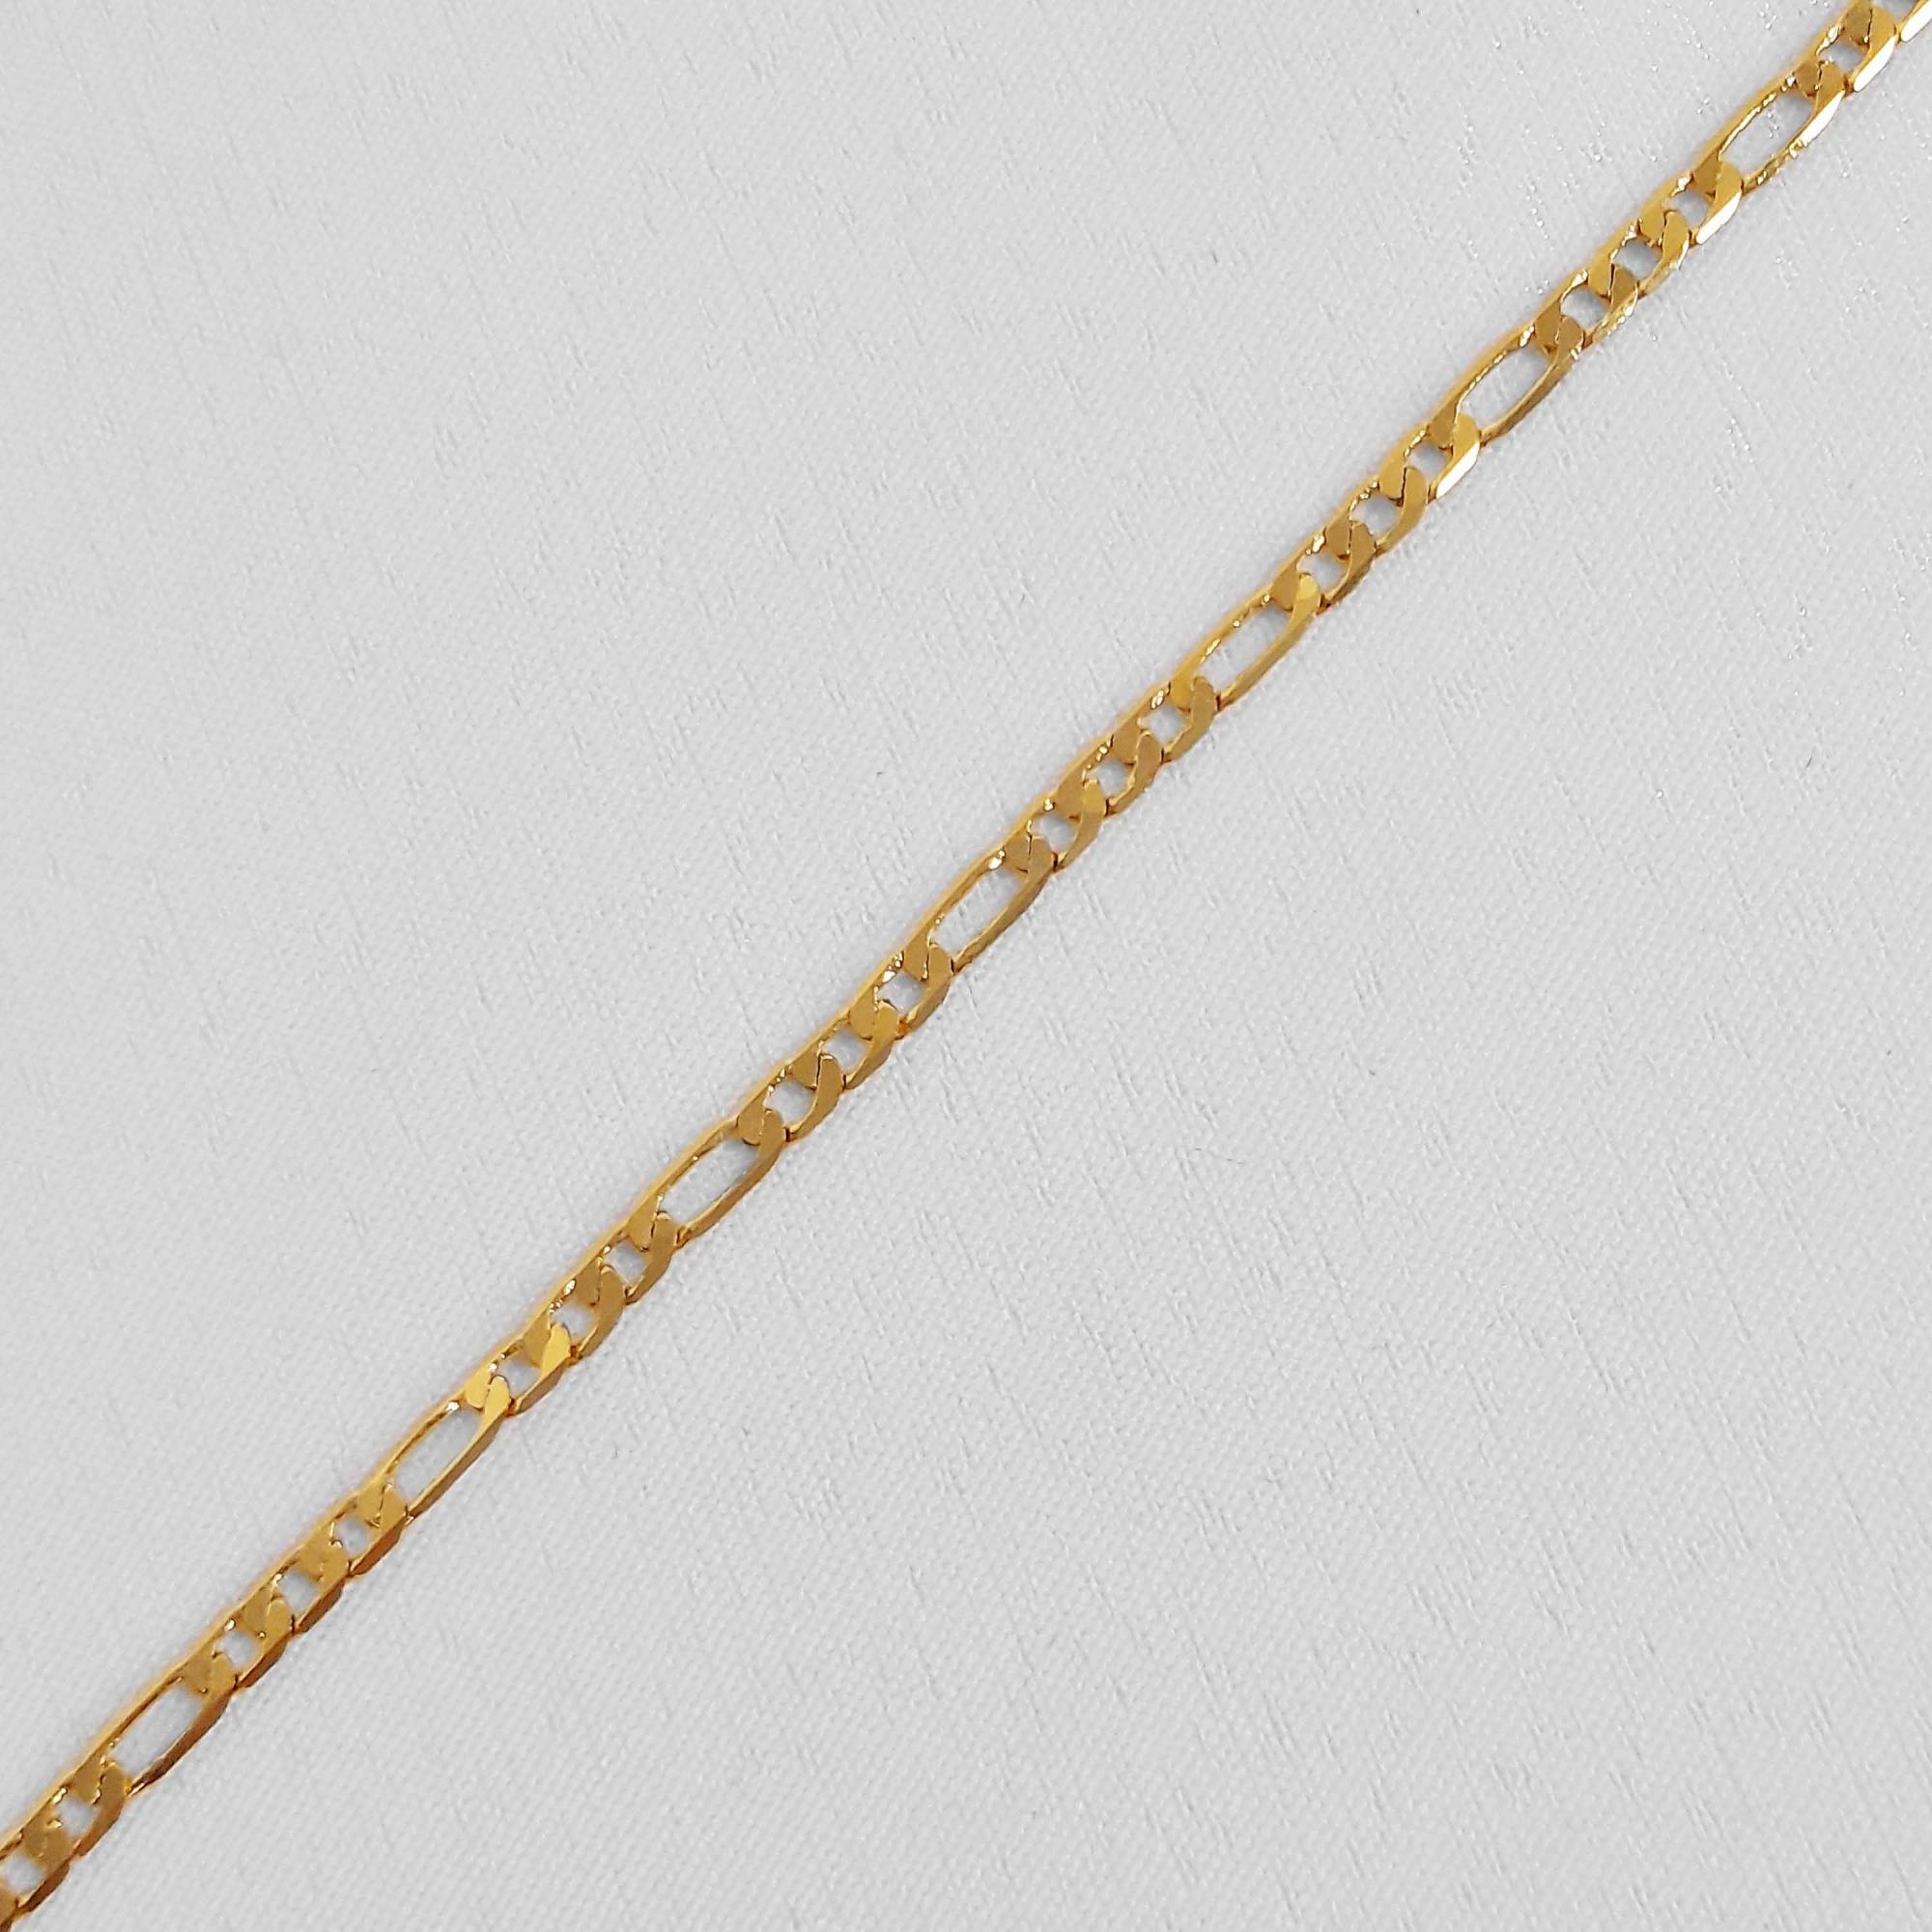 Pulseira Masculina 3x1 2,5mm Folheado a Ouro 18k  - Lunozê Joias